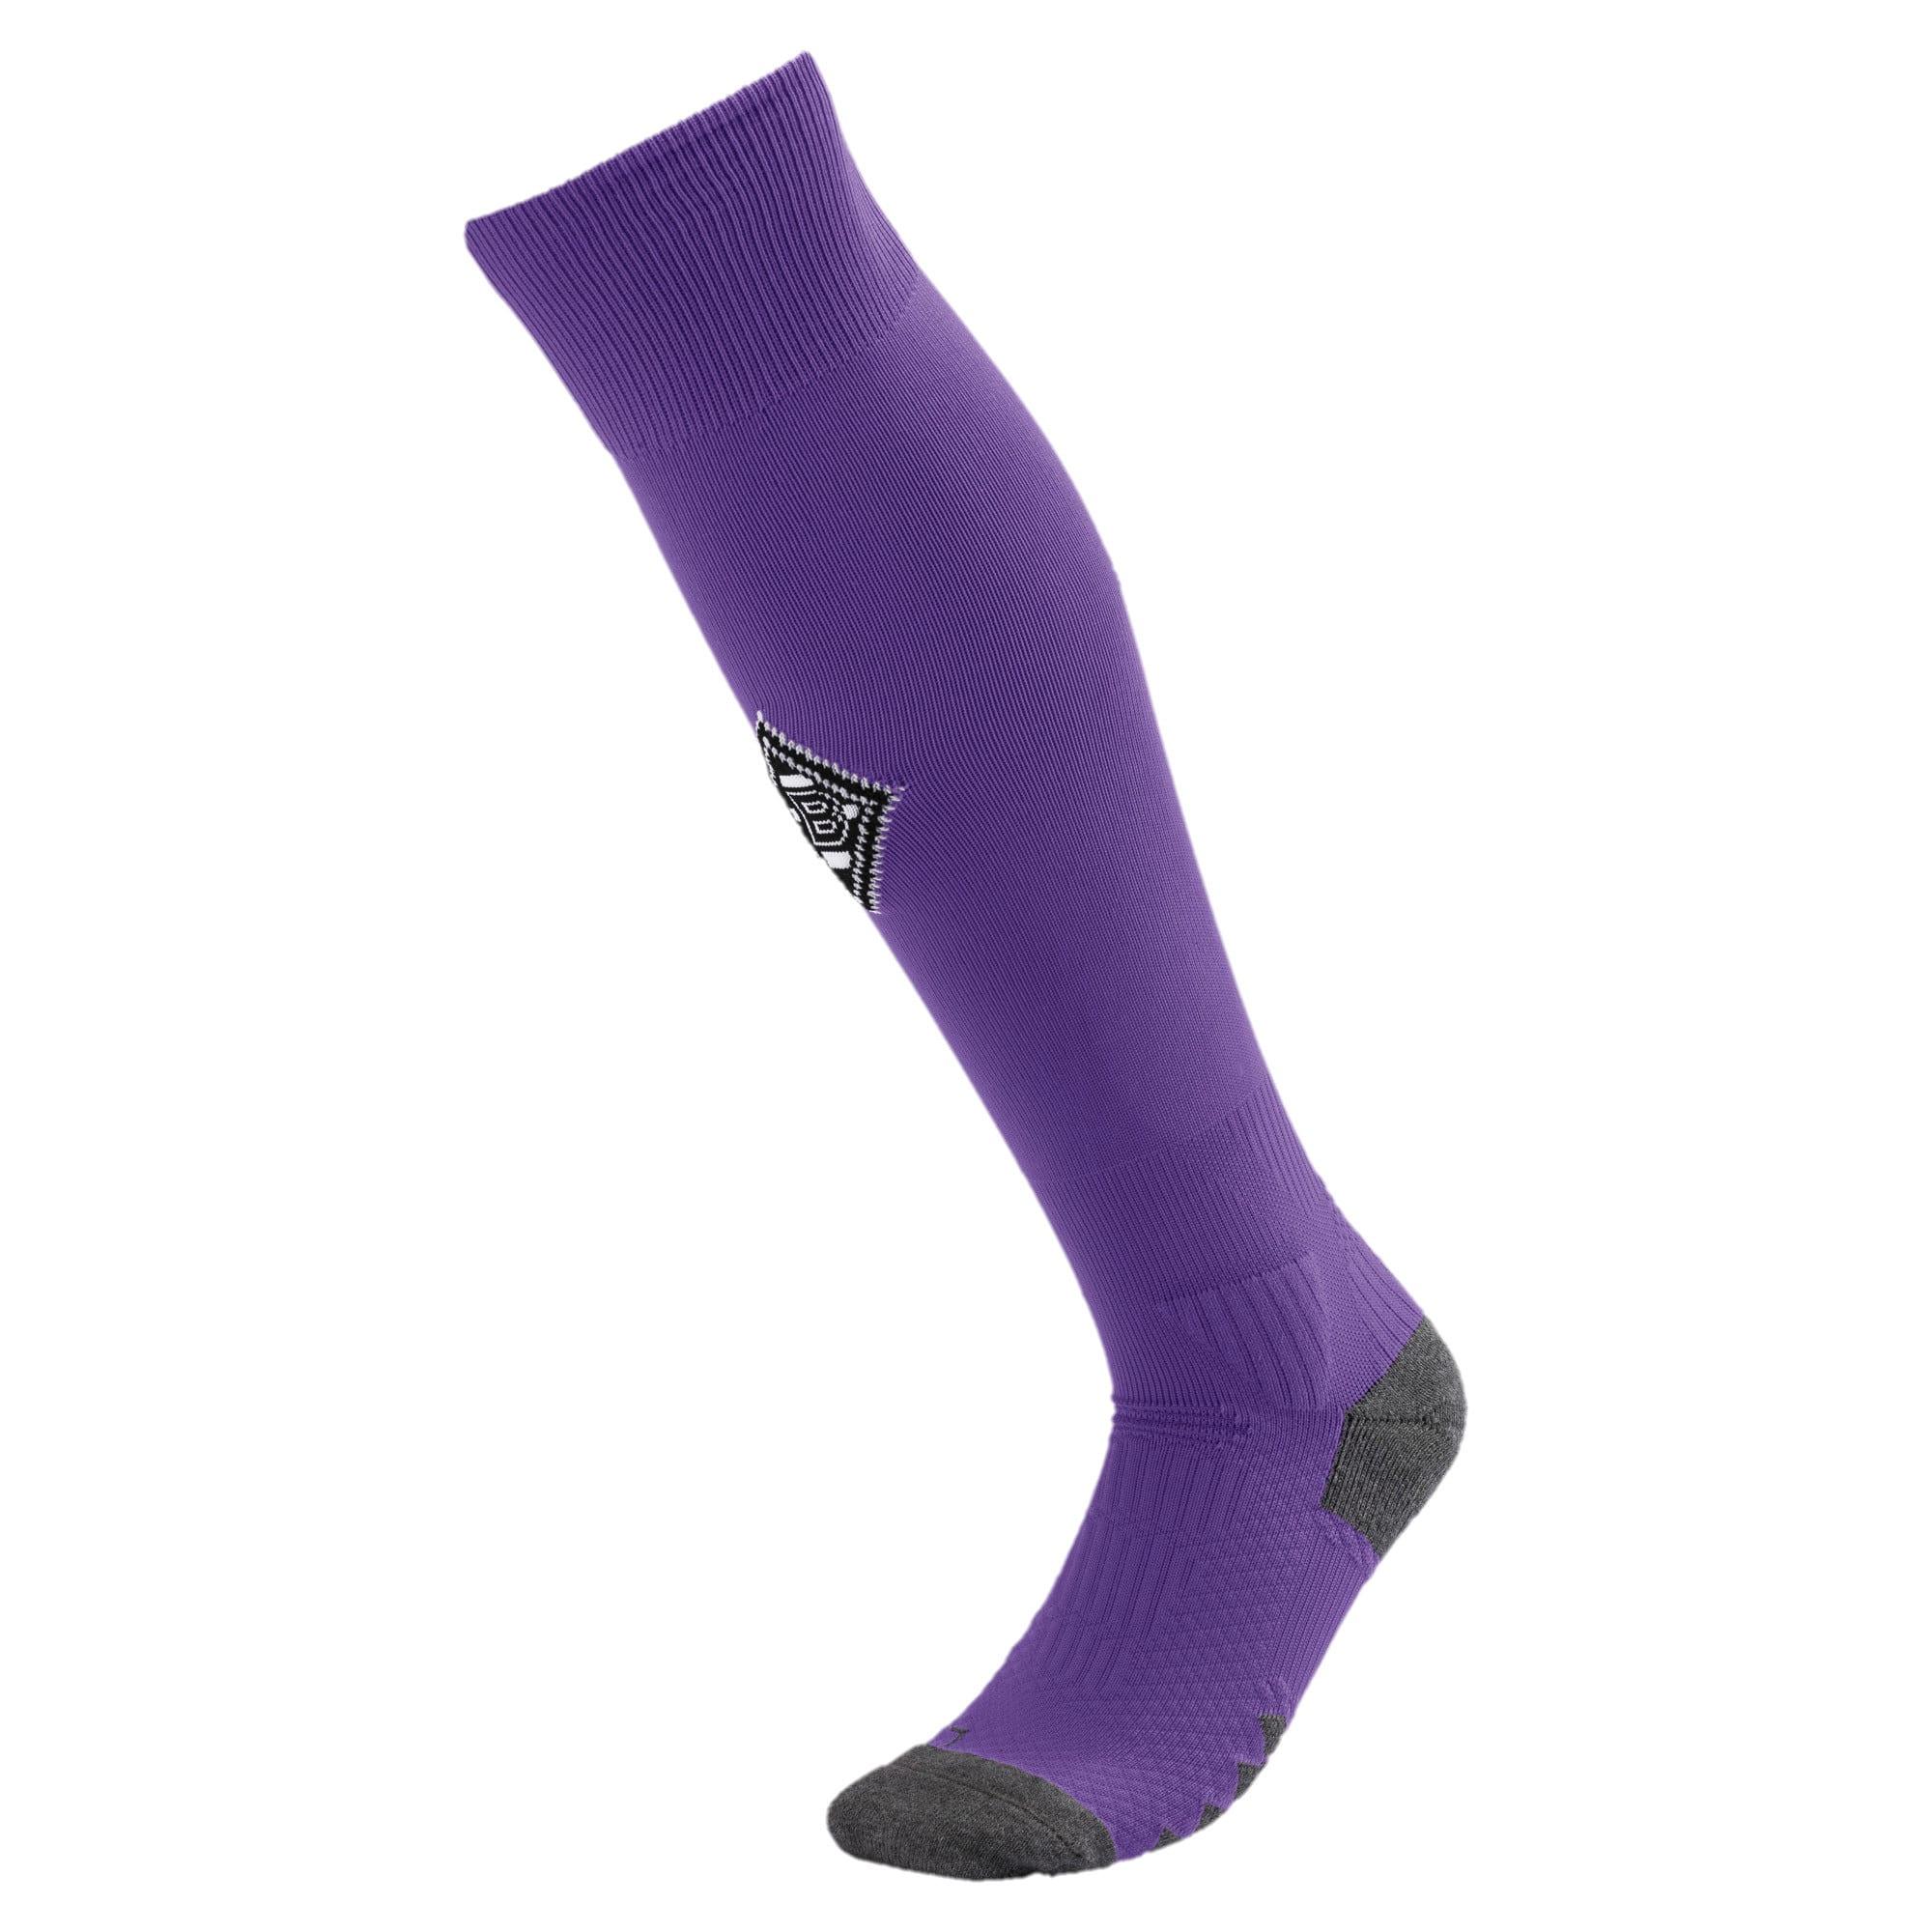 Thumbnail 1 of Borussia Mönchengladbach Men's Football Socks, Prism Violet-Puma White, medium